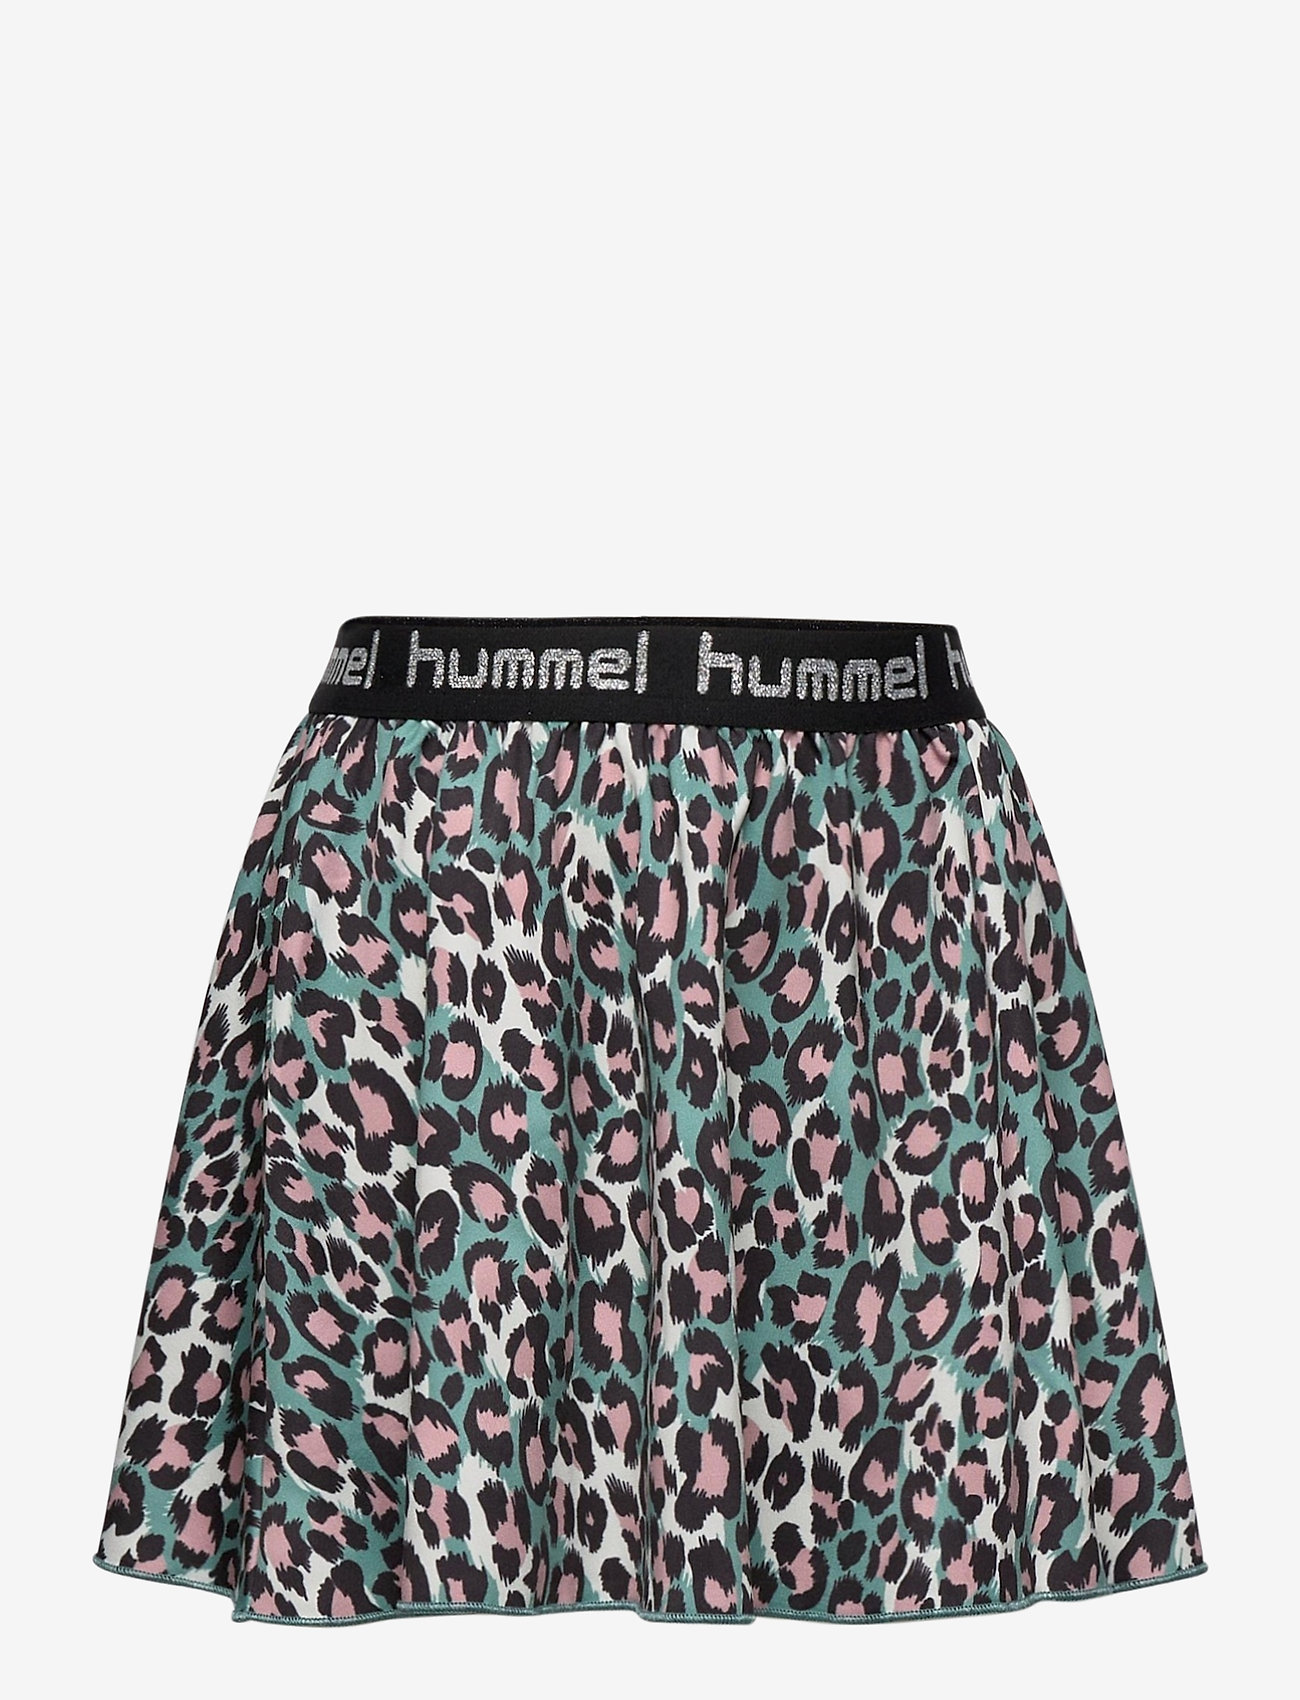 Hummel - hmlNANNA SKIRT - spódnice - oil blue - 0